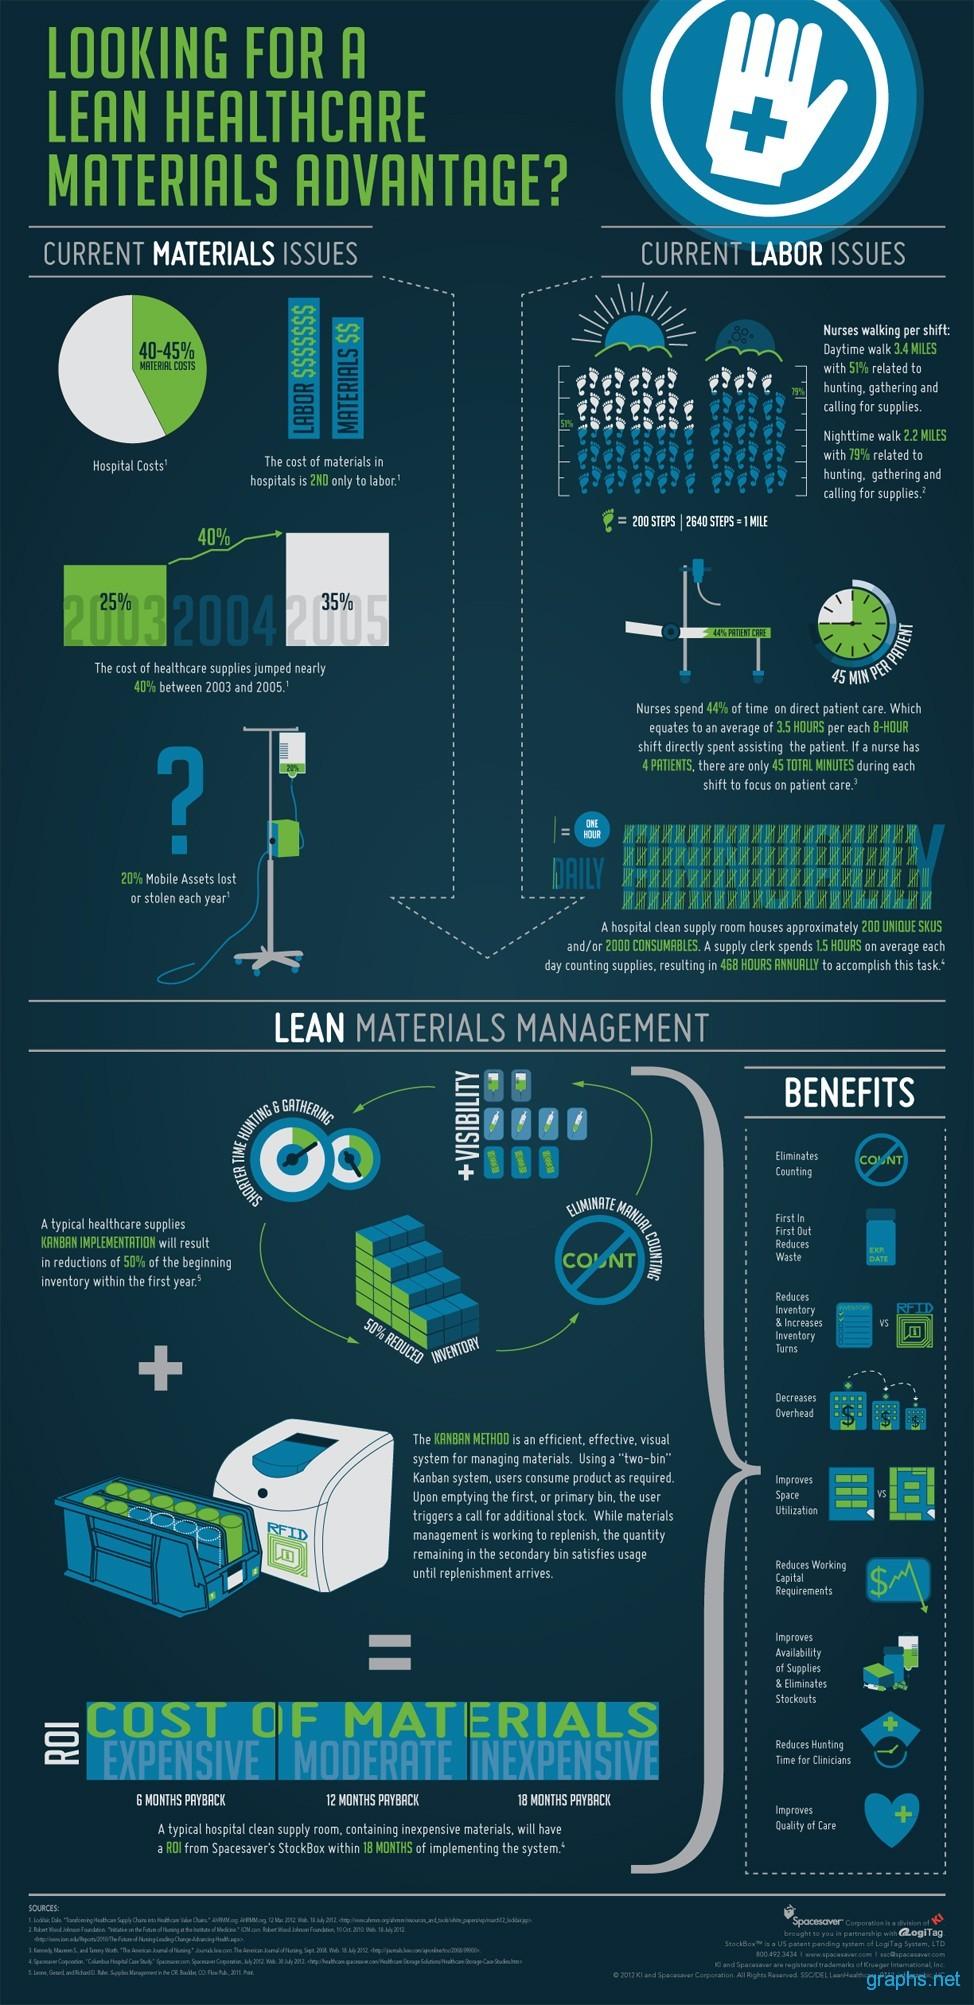 Lean Healthcare Materials Advantage